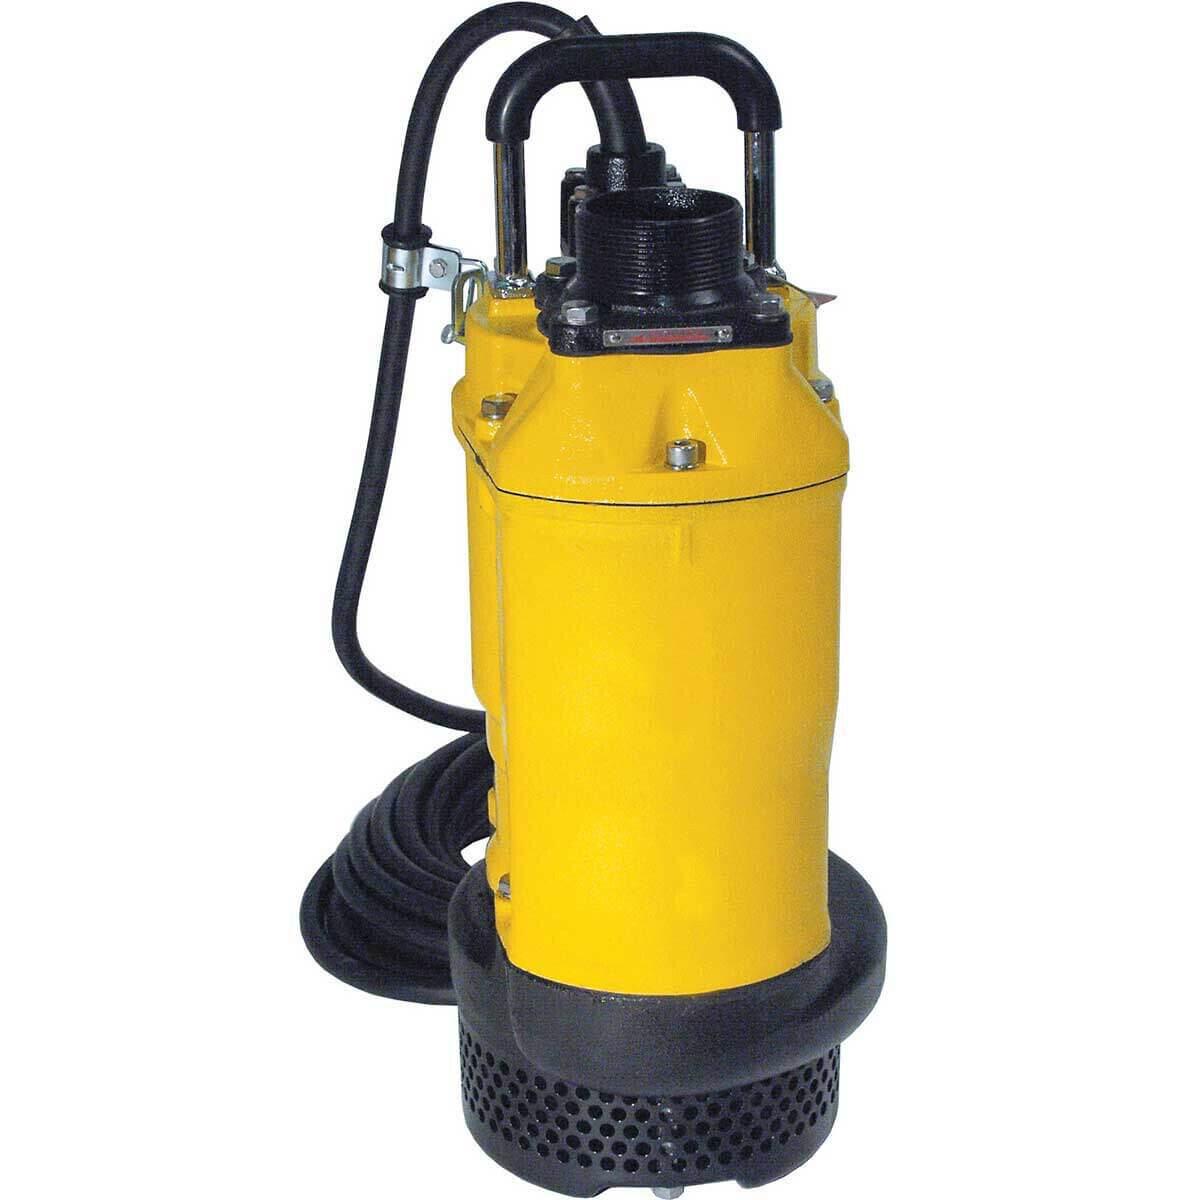 Wacker Neuson PS35503 Submersible Pump